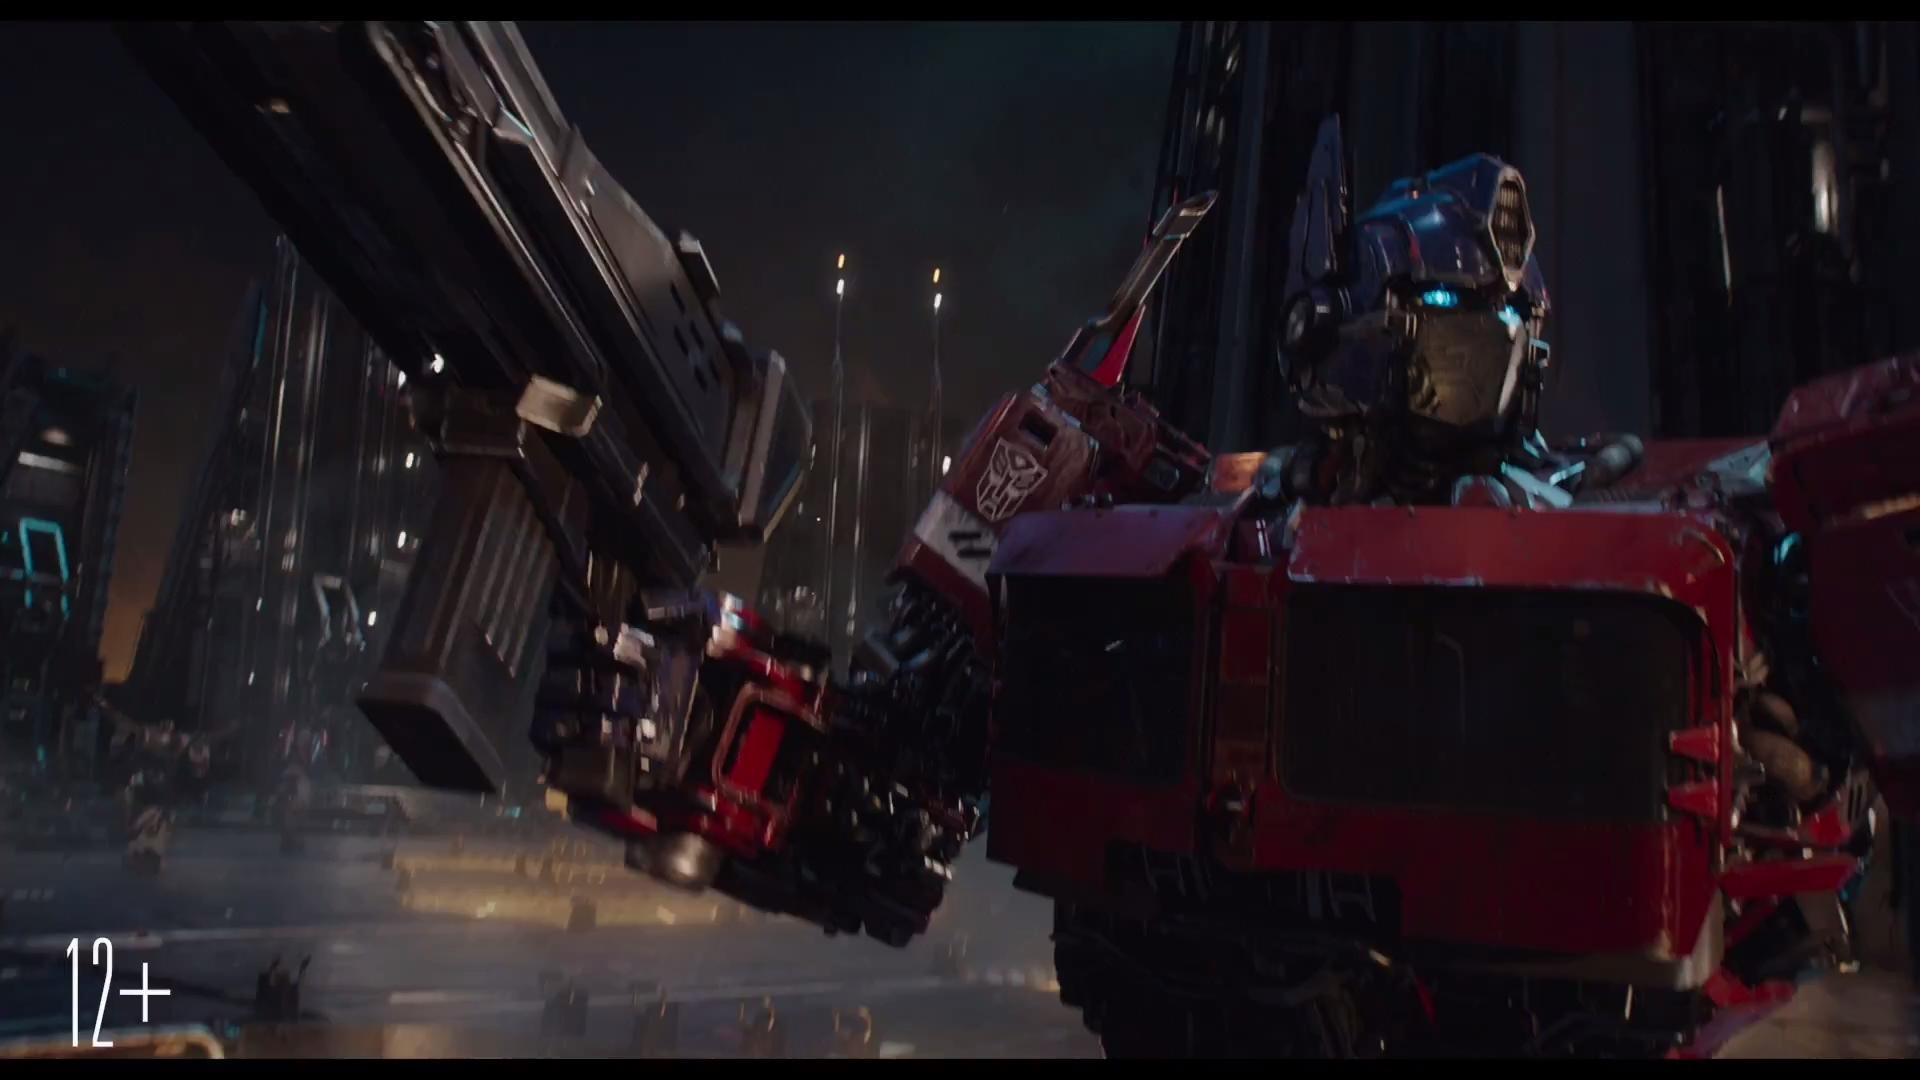 Transformers Bumblebee Movie Trailer 3 Hd Screen Caps